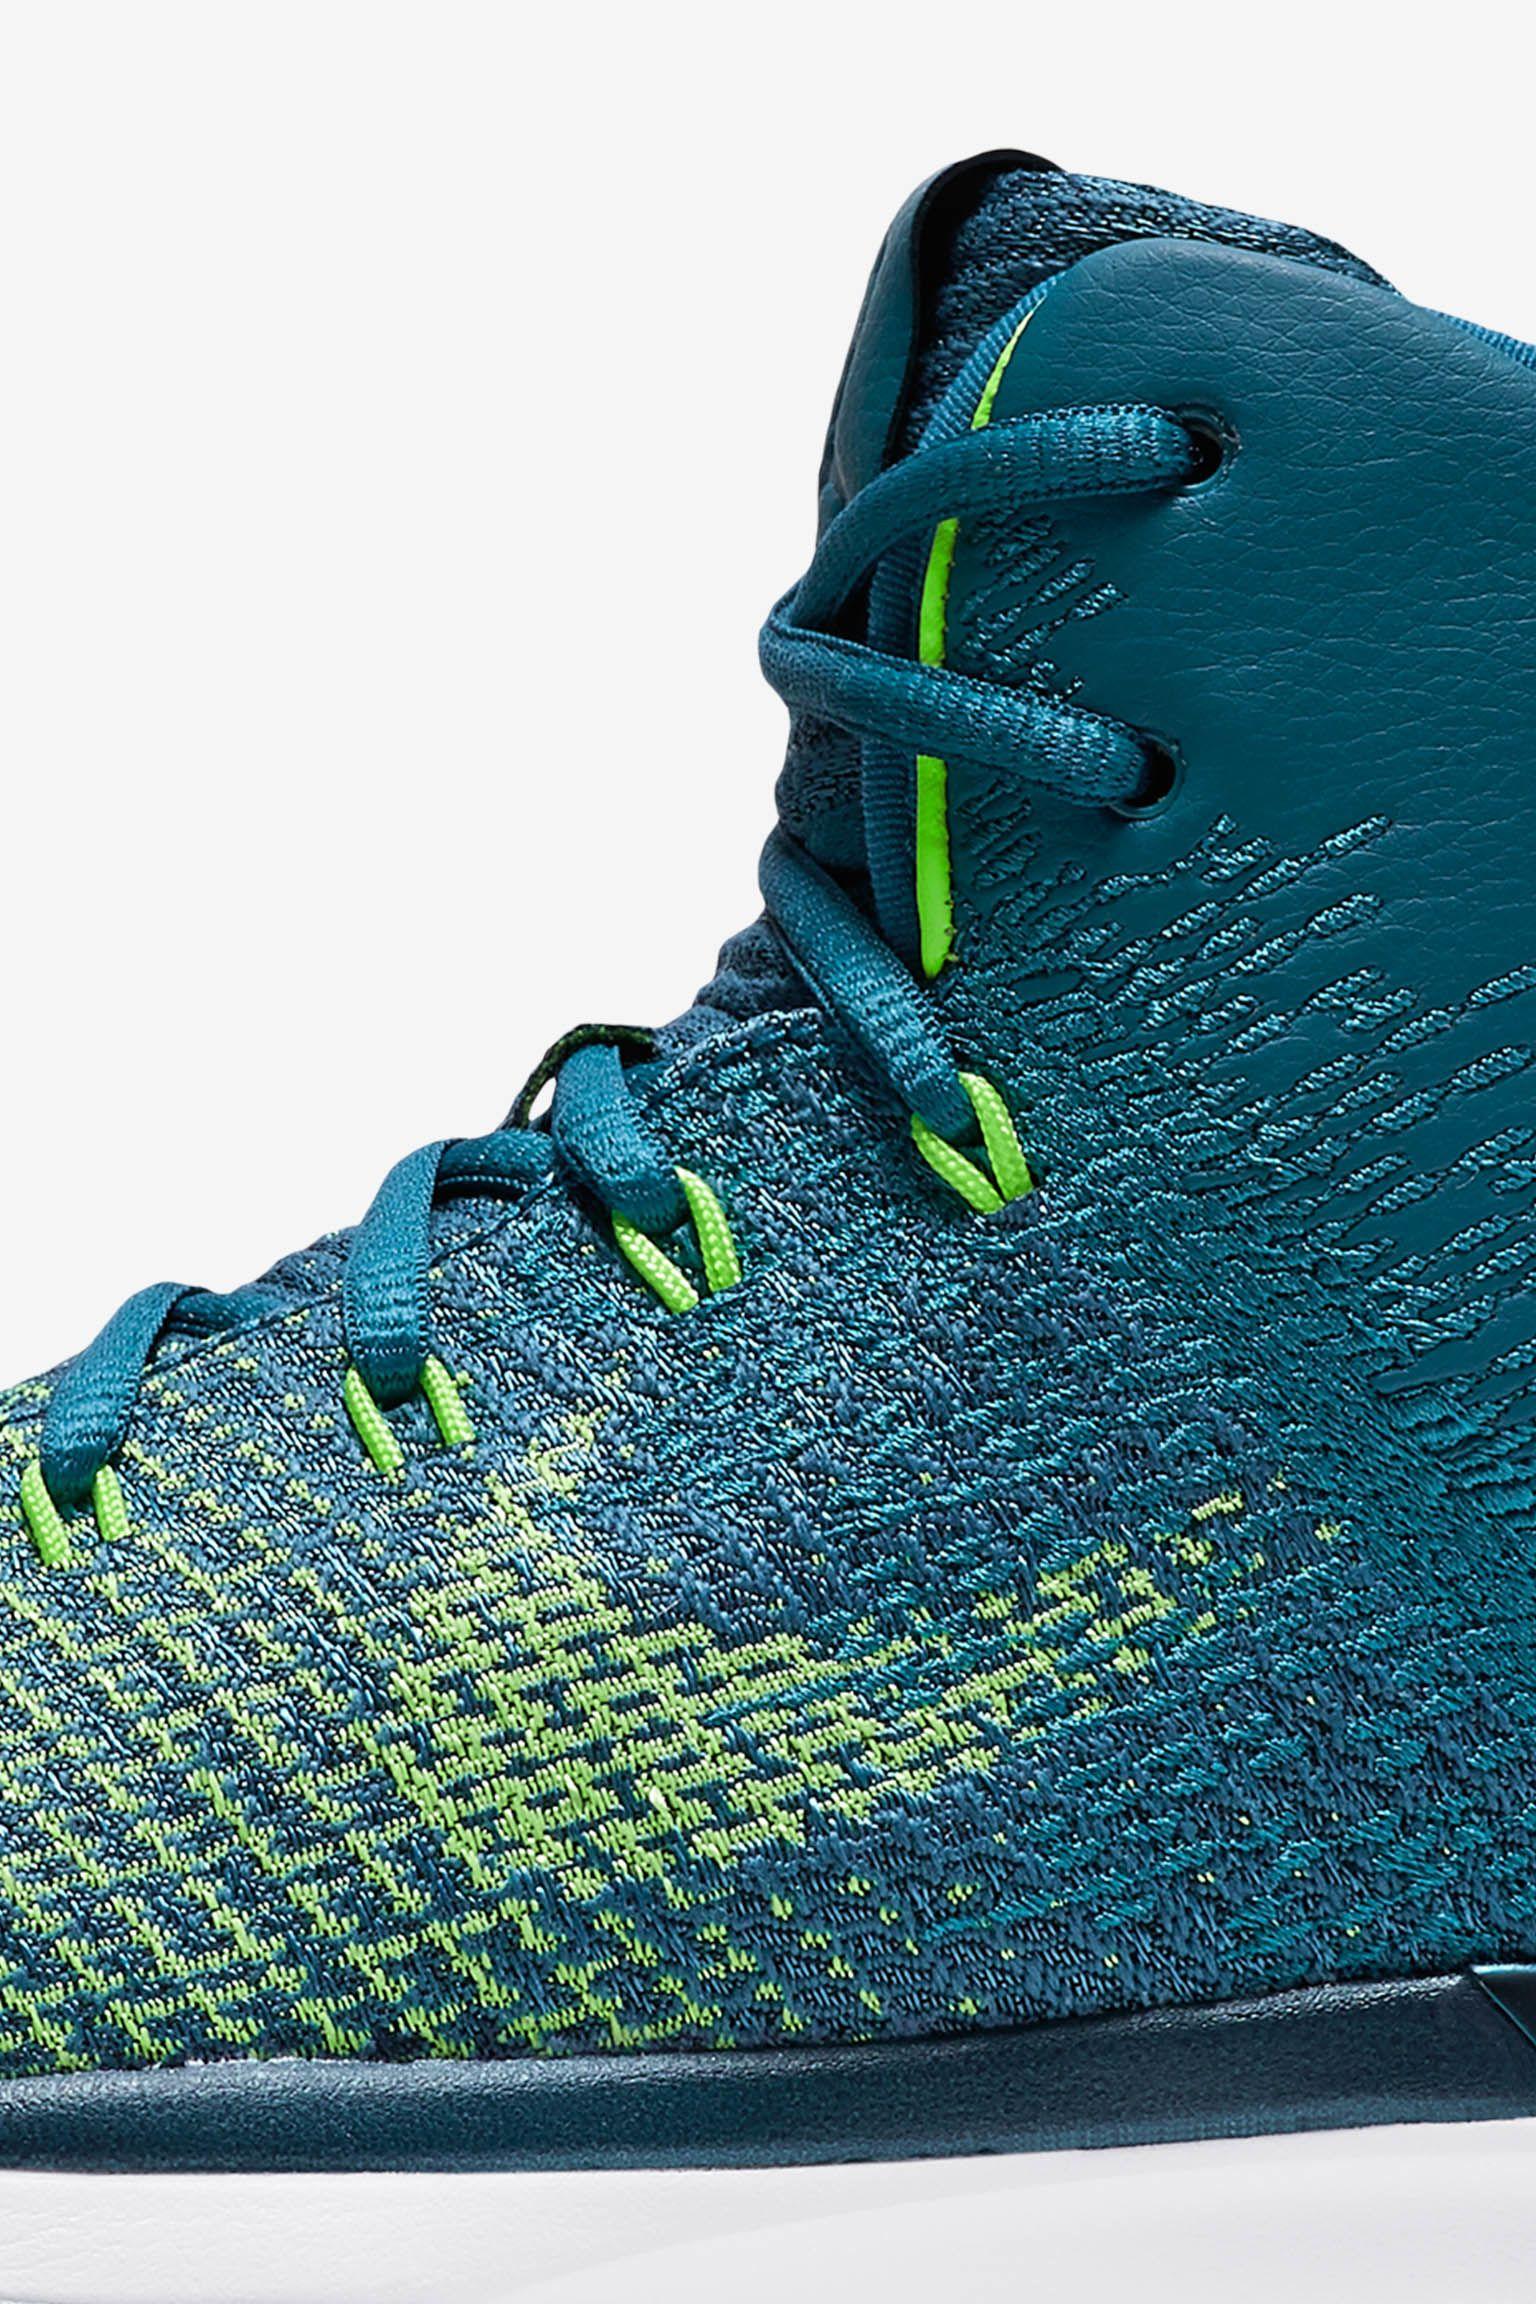 Air Jordan 31 'Green Abyss' Release Date